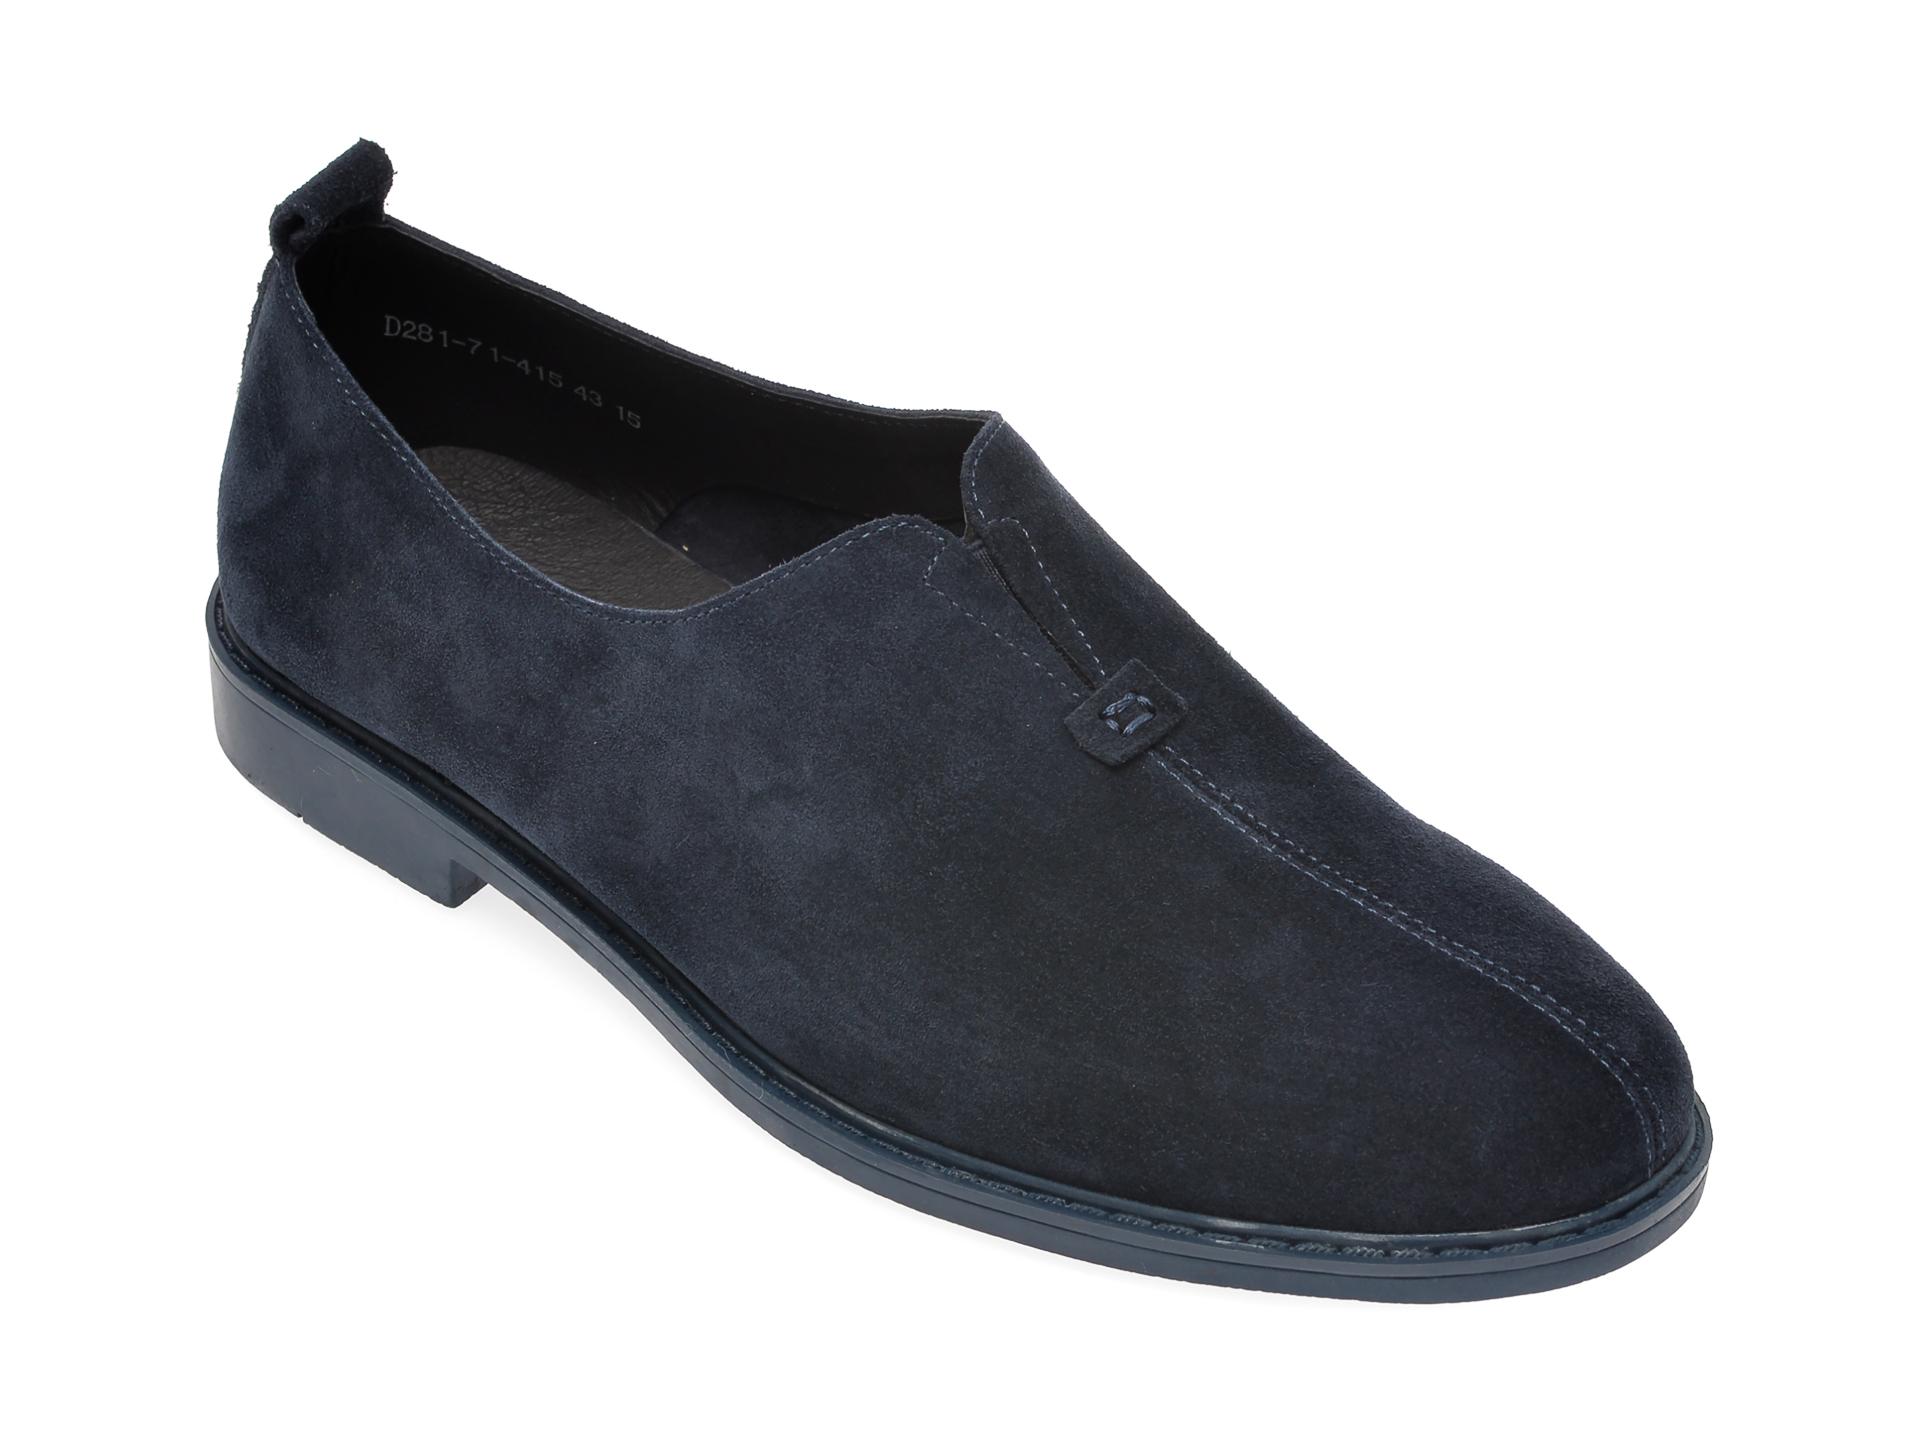 Pantofi OTTER bleumarin, D281714, din piele intoarsa imagine